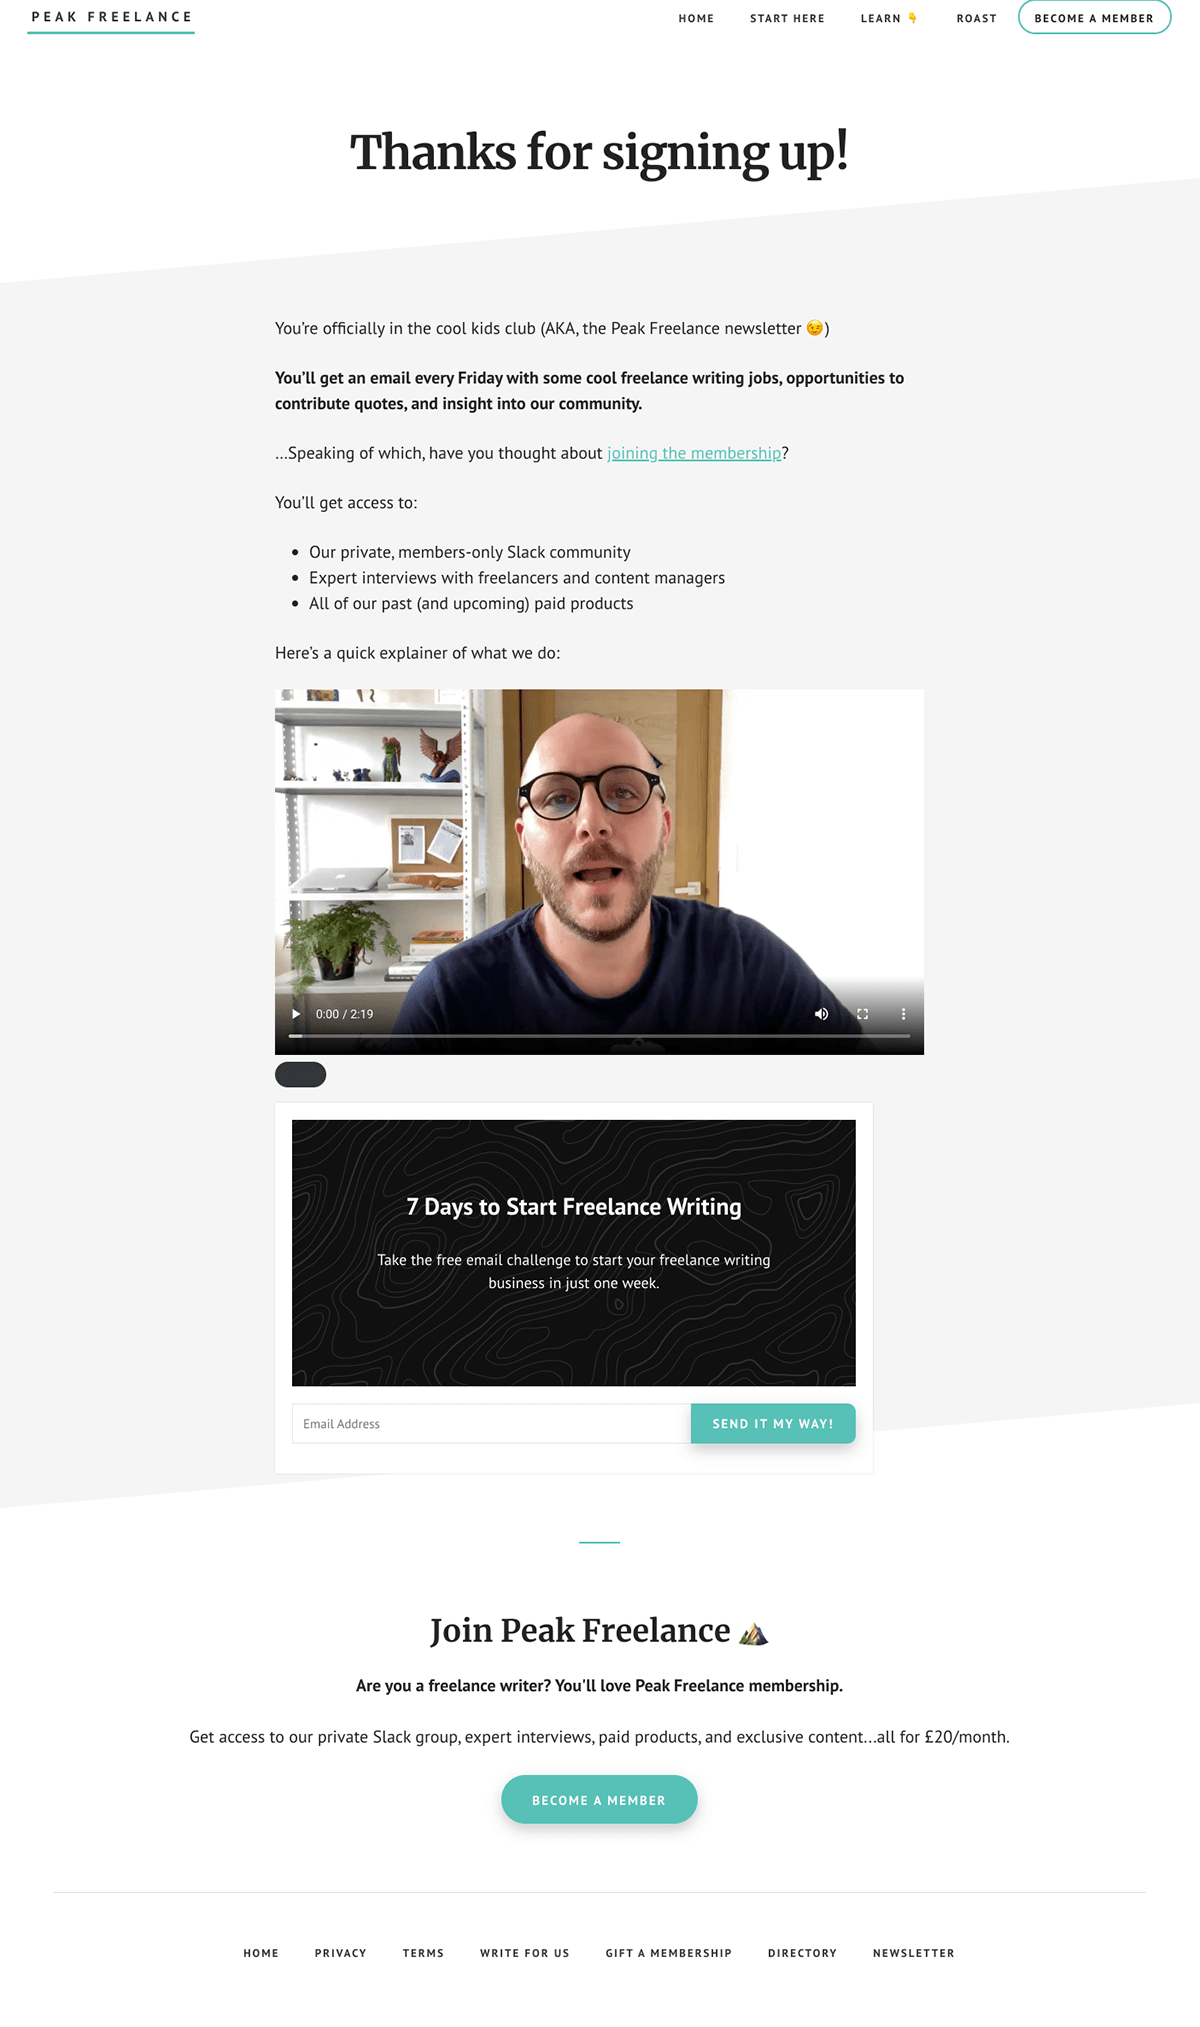 Peak Freelance thank you page example